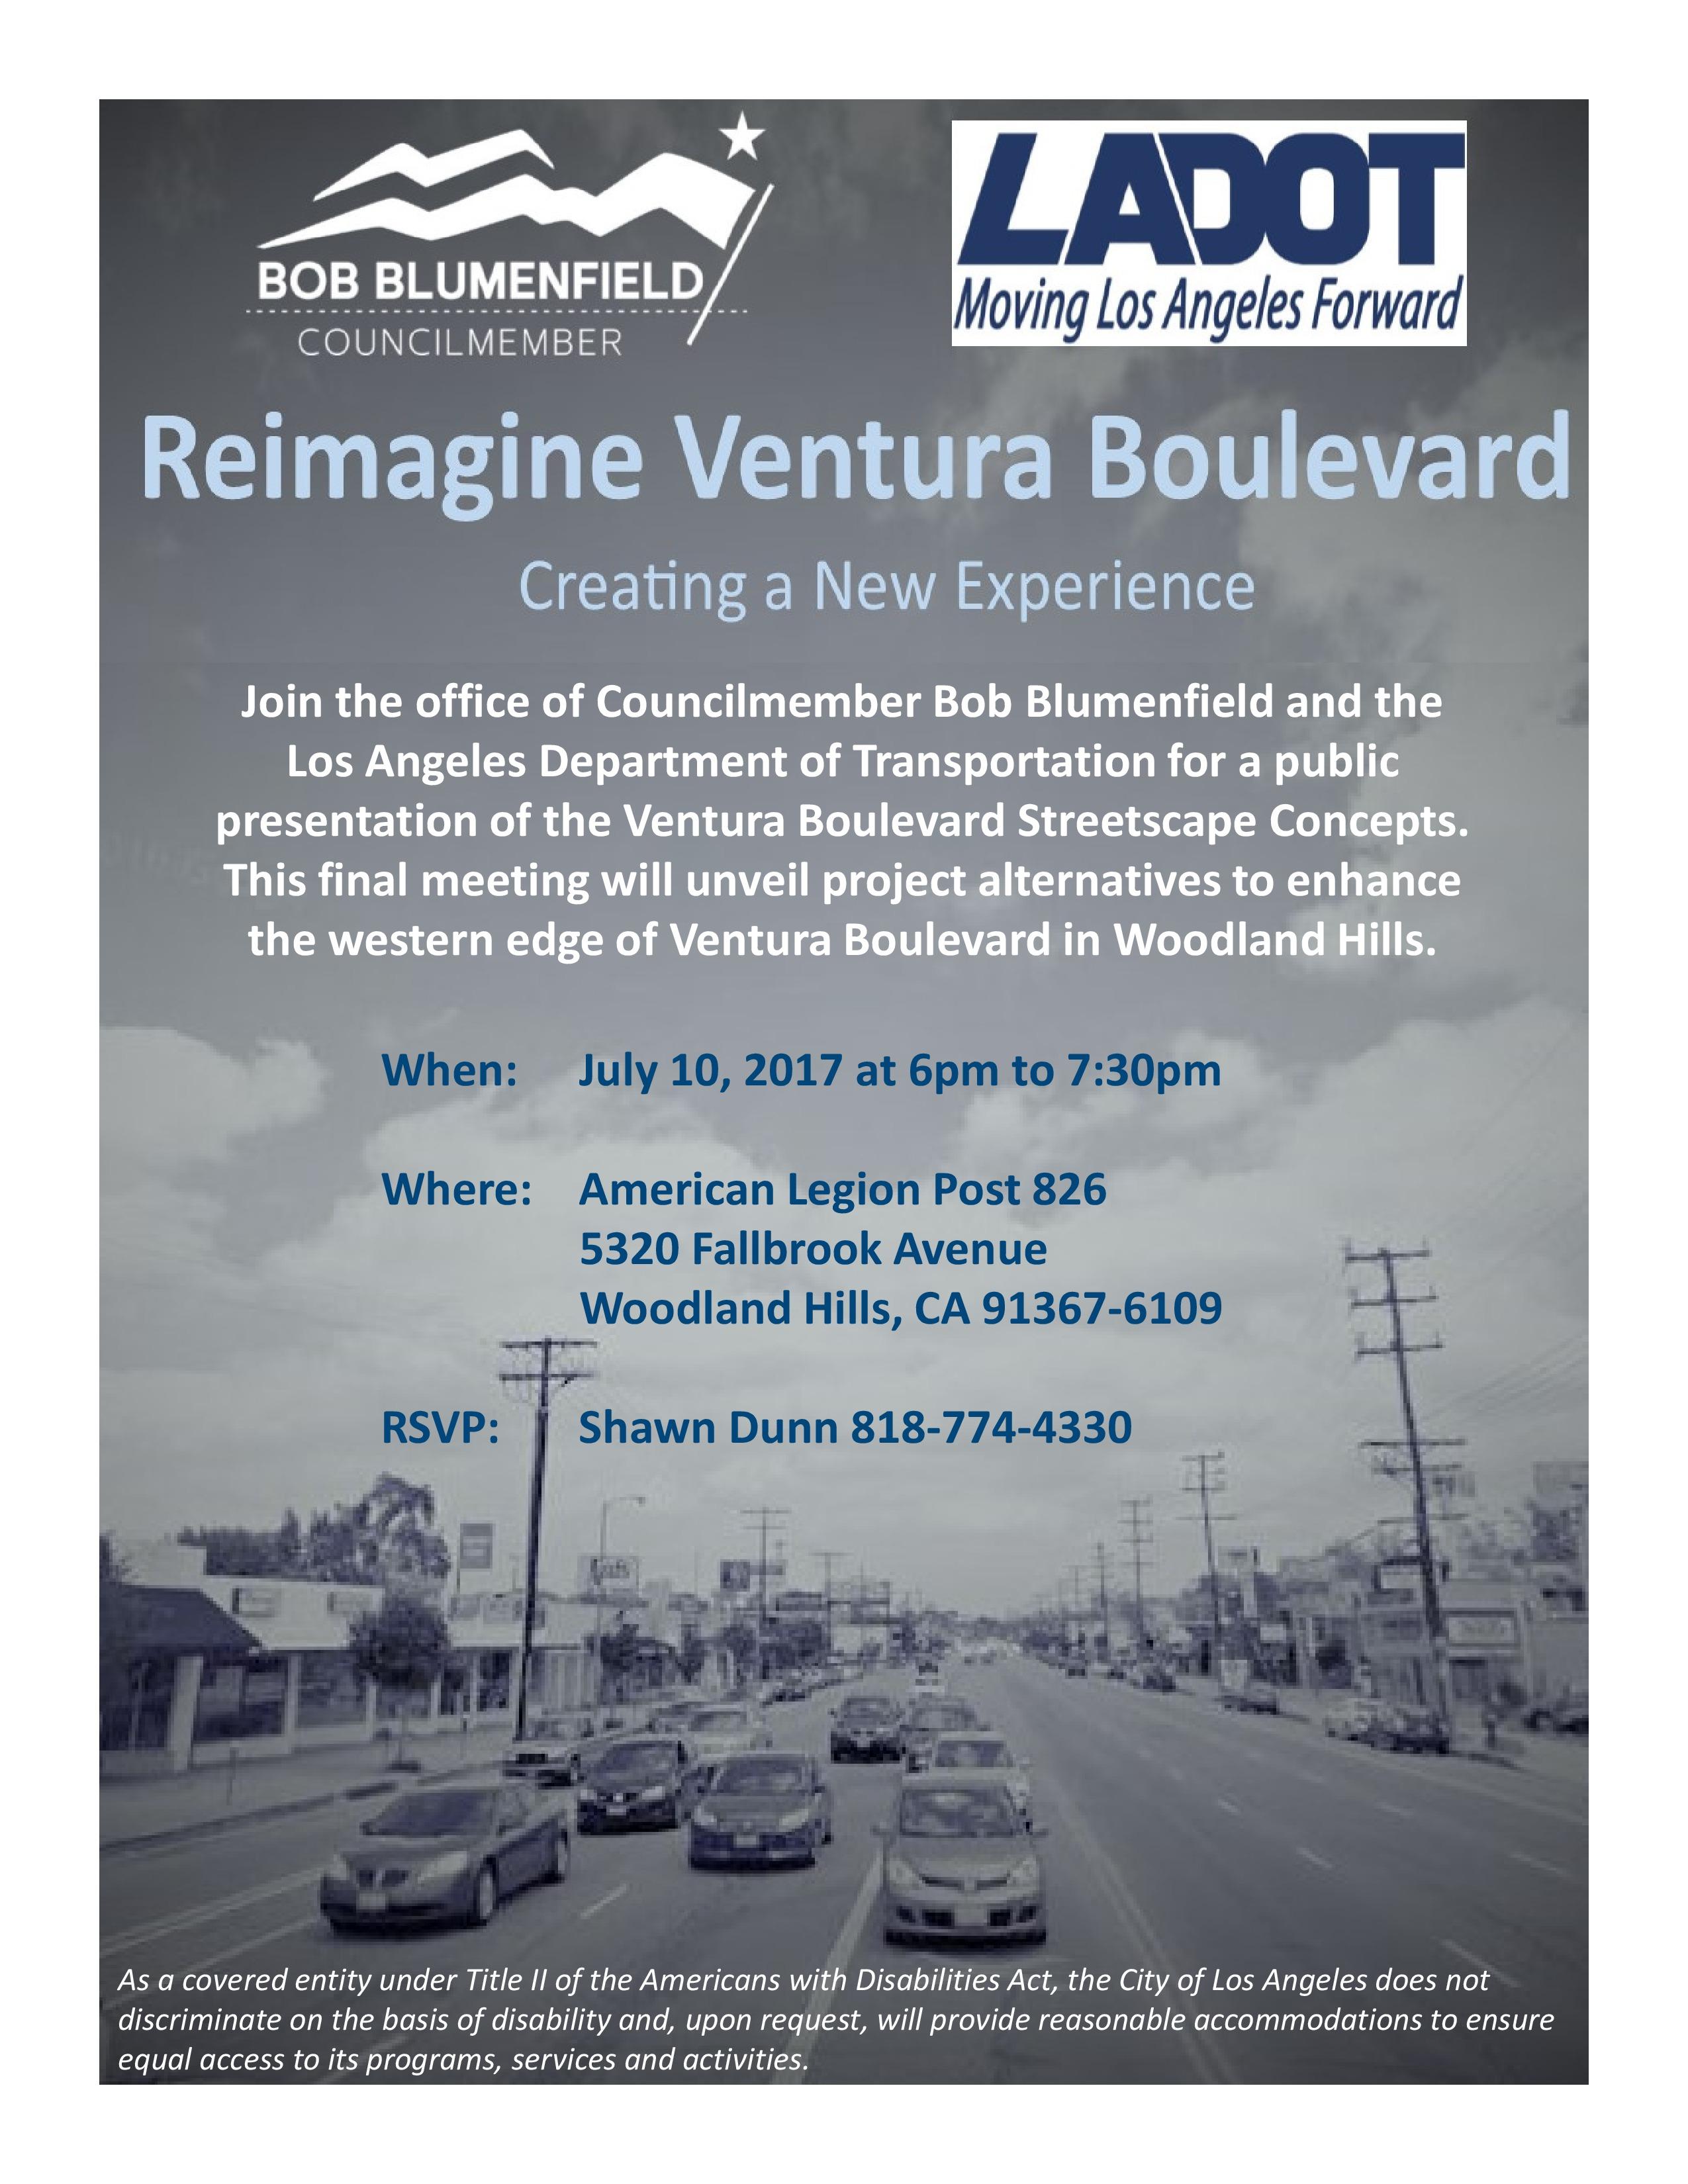 Ventura_Public_Meeting_Flyer_7-10-17_Final-page-0.jpg